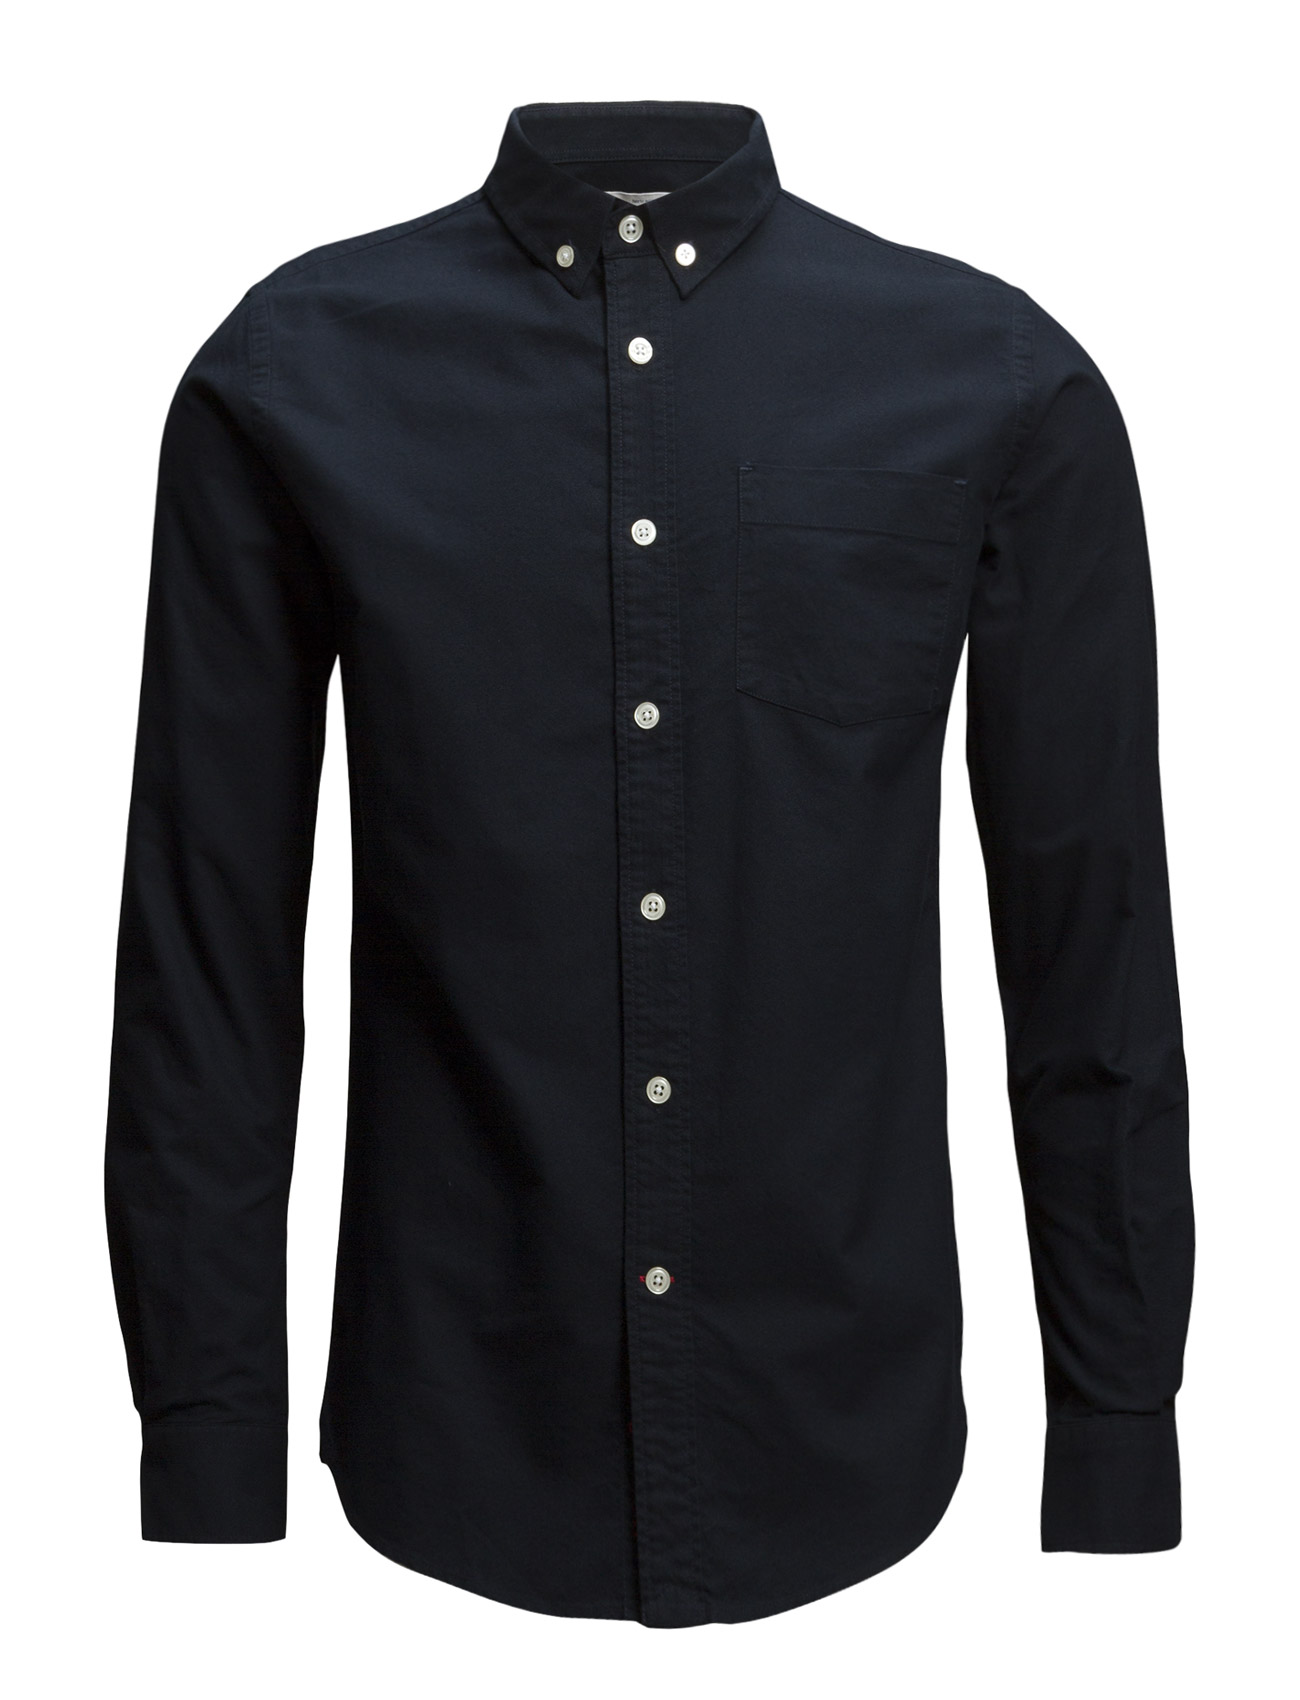 Billede af Button Down Oxford Shirt - Gots